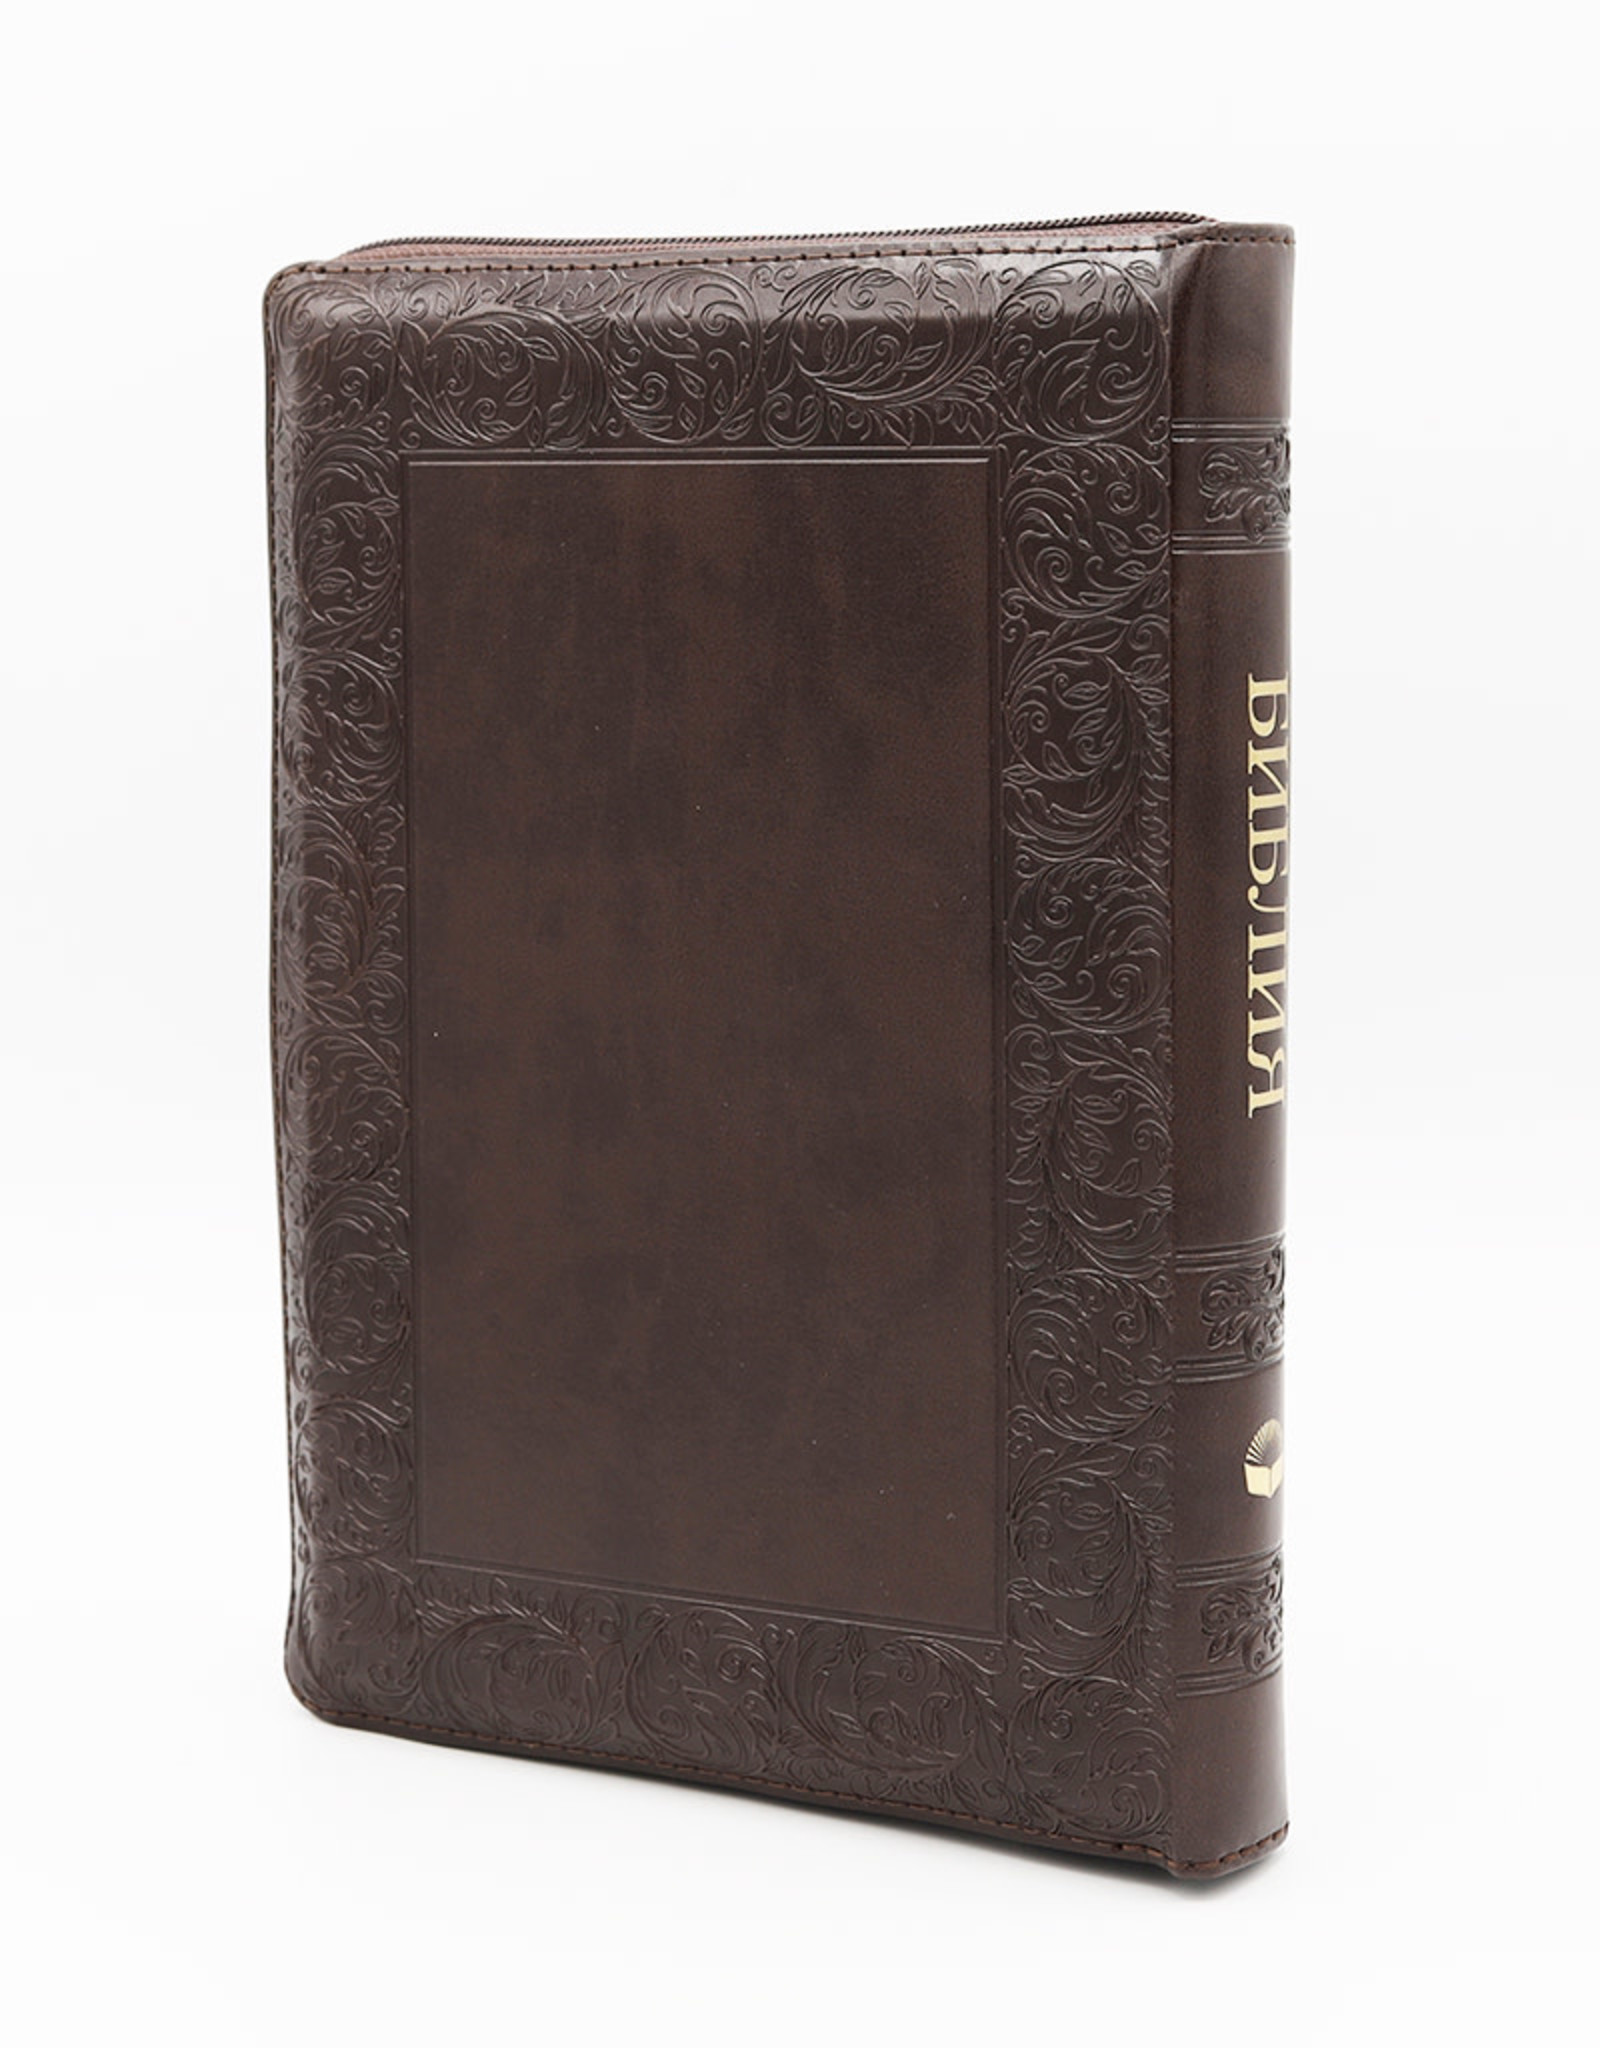 Библия, Каноническая (SYNO), Index, Leather with Zipper, Medium Brown, Leather